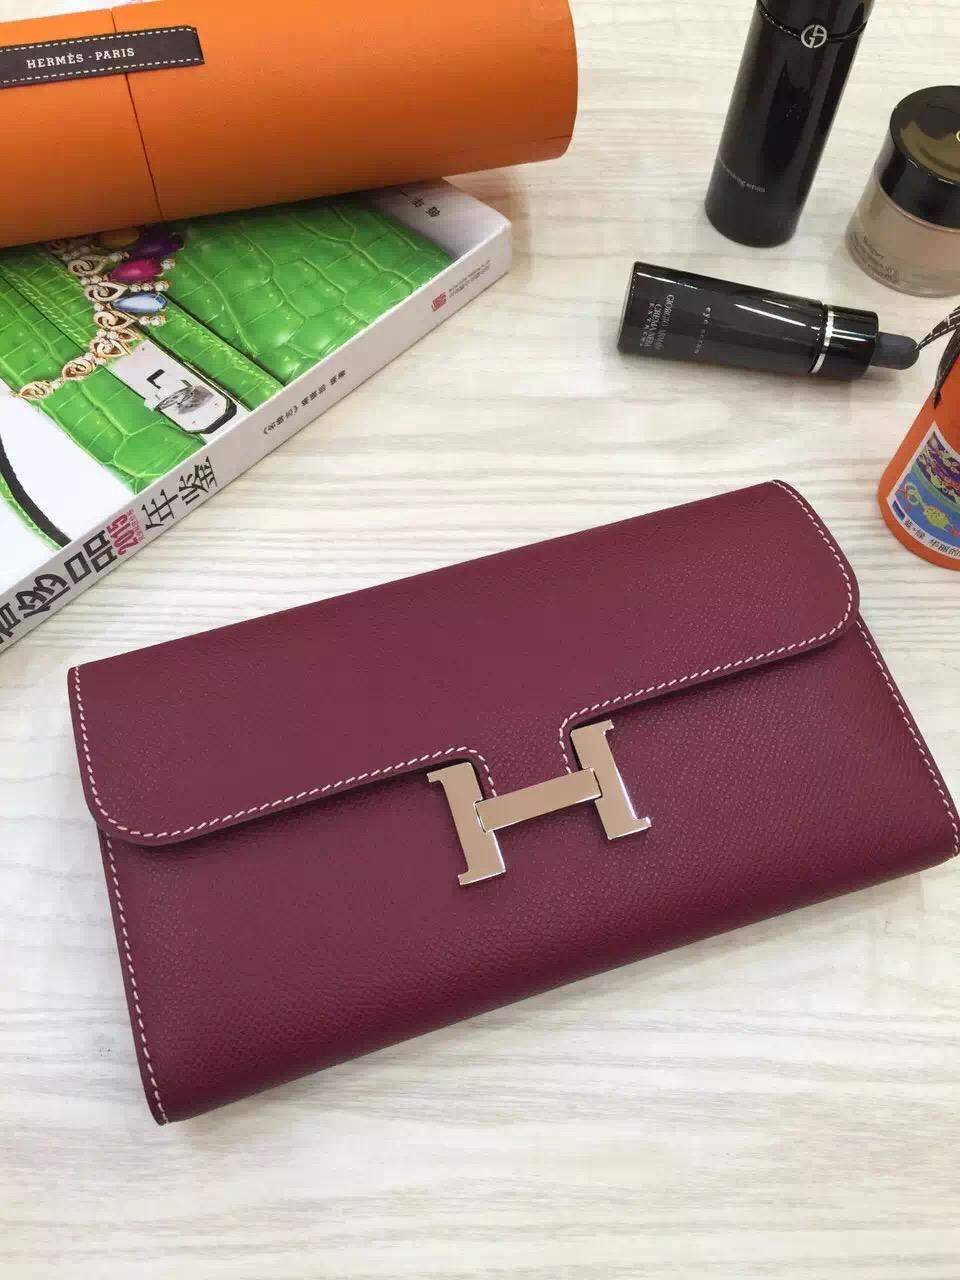 Hand Stitching Hermes Constance Wallet Burgundy Epsom Leather Clutch Handbag